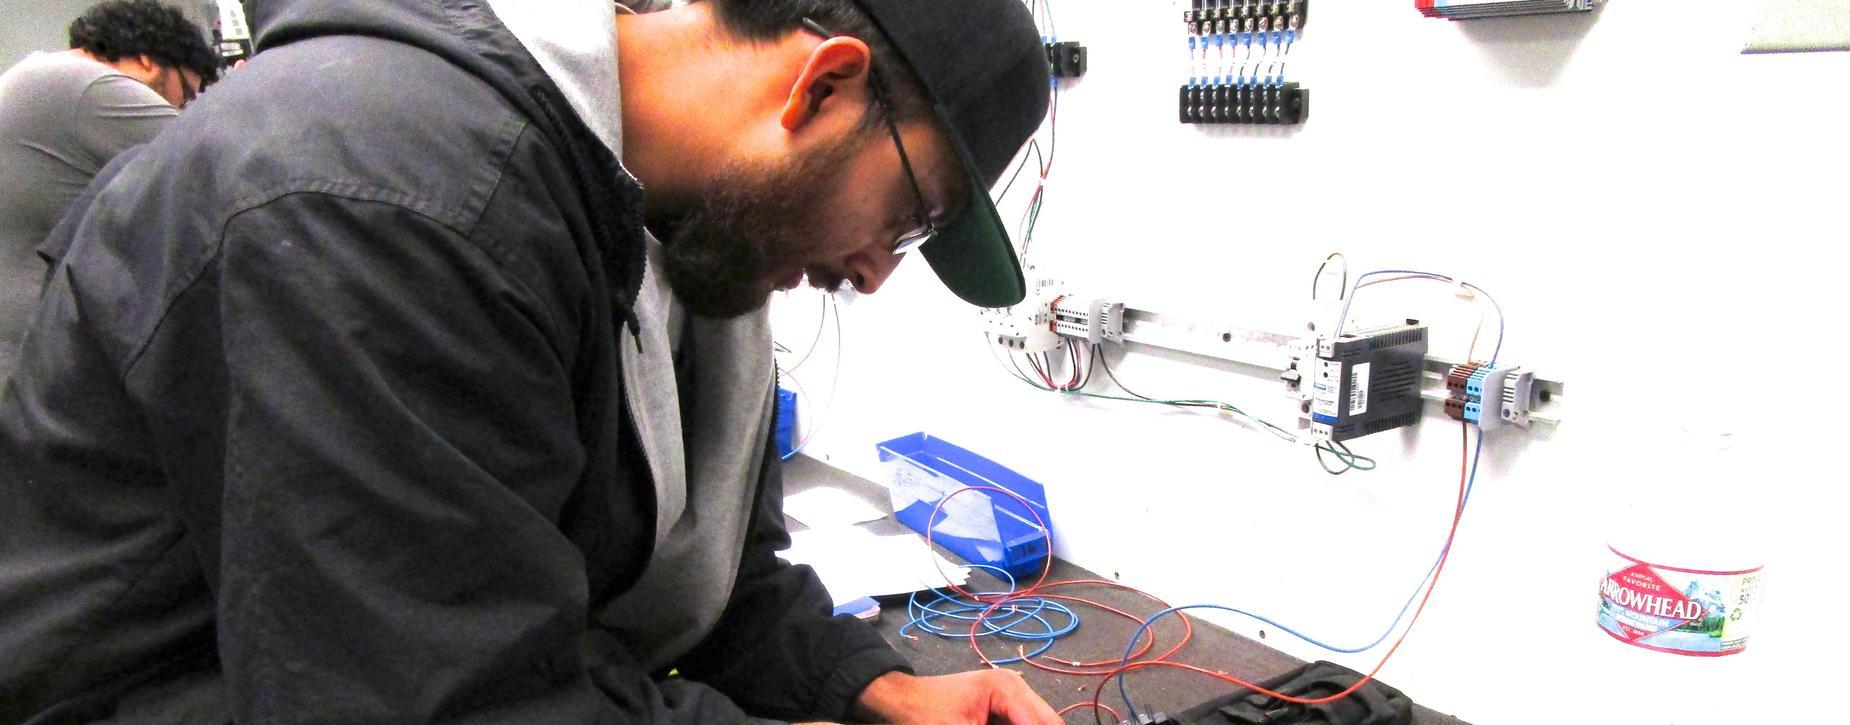 Electrician class